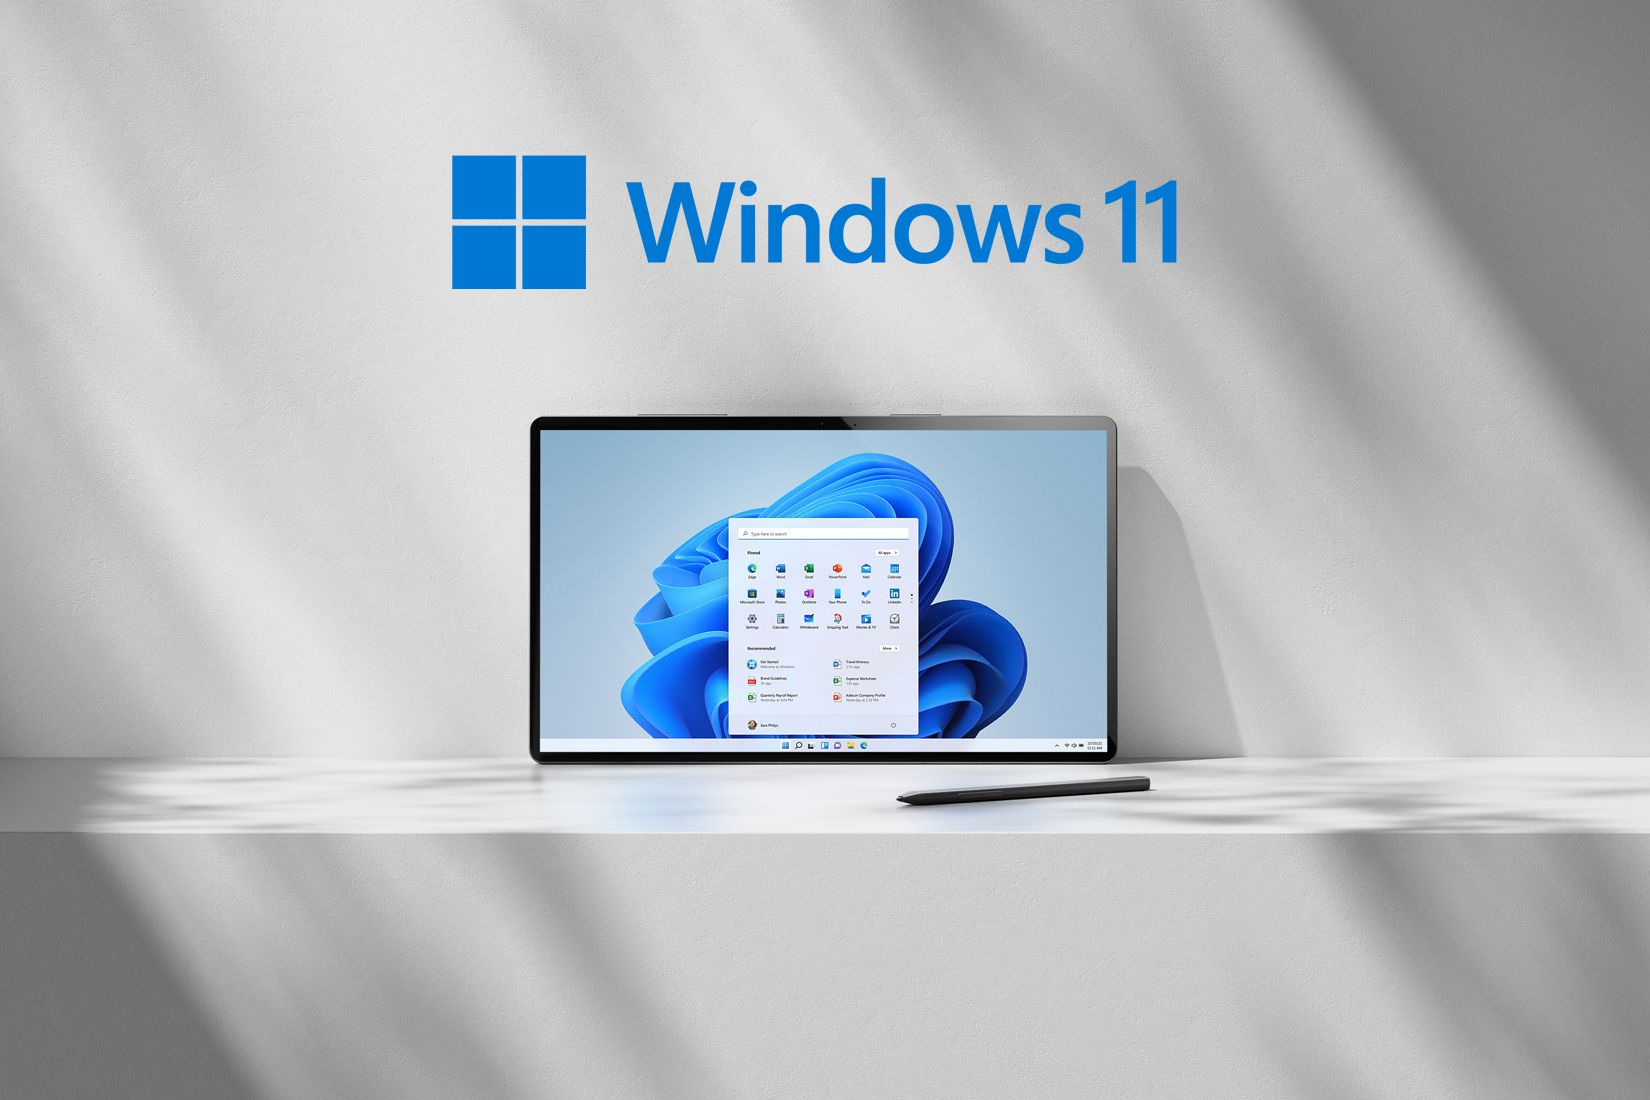 Windows11 Image on Laptop